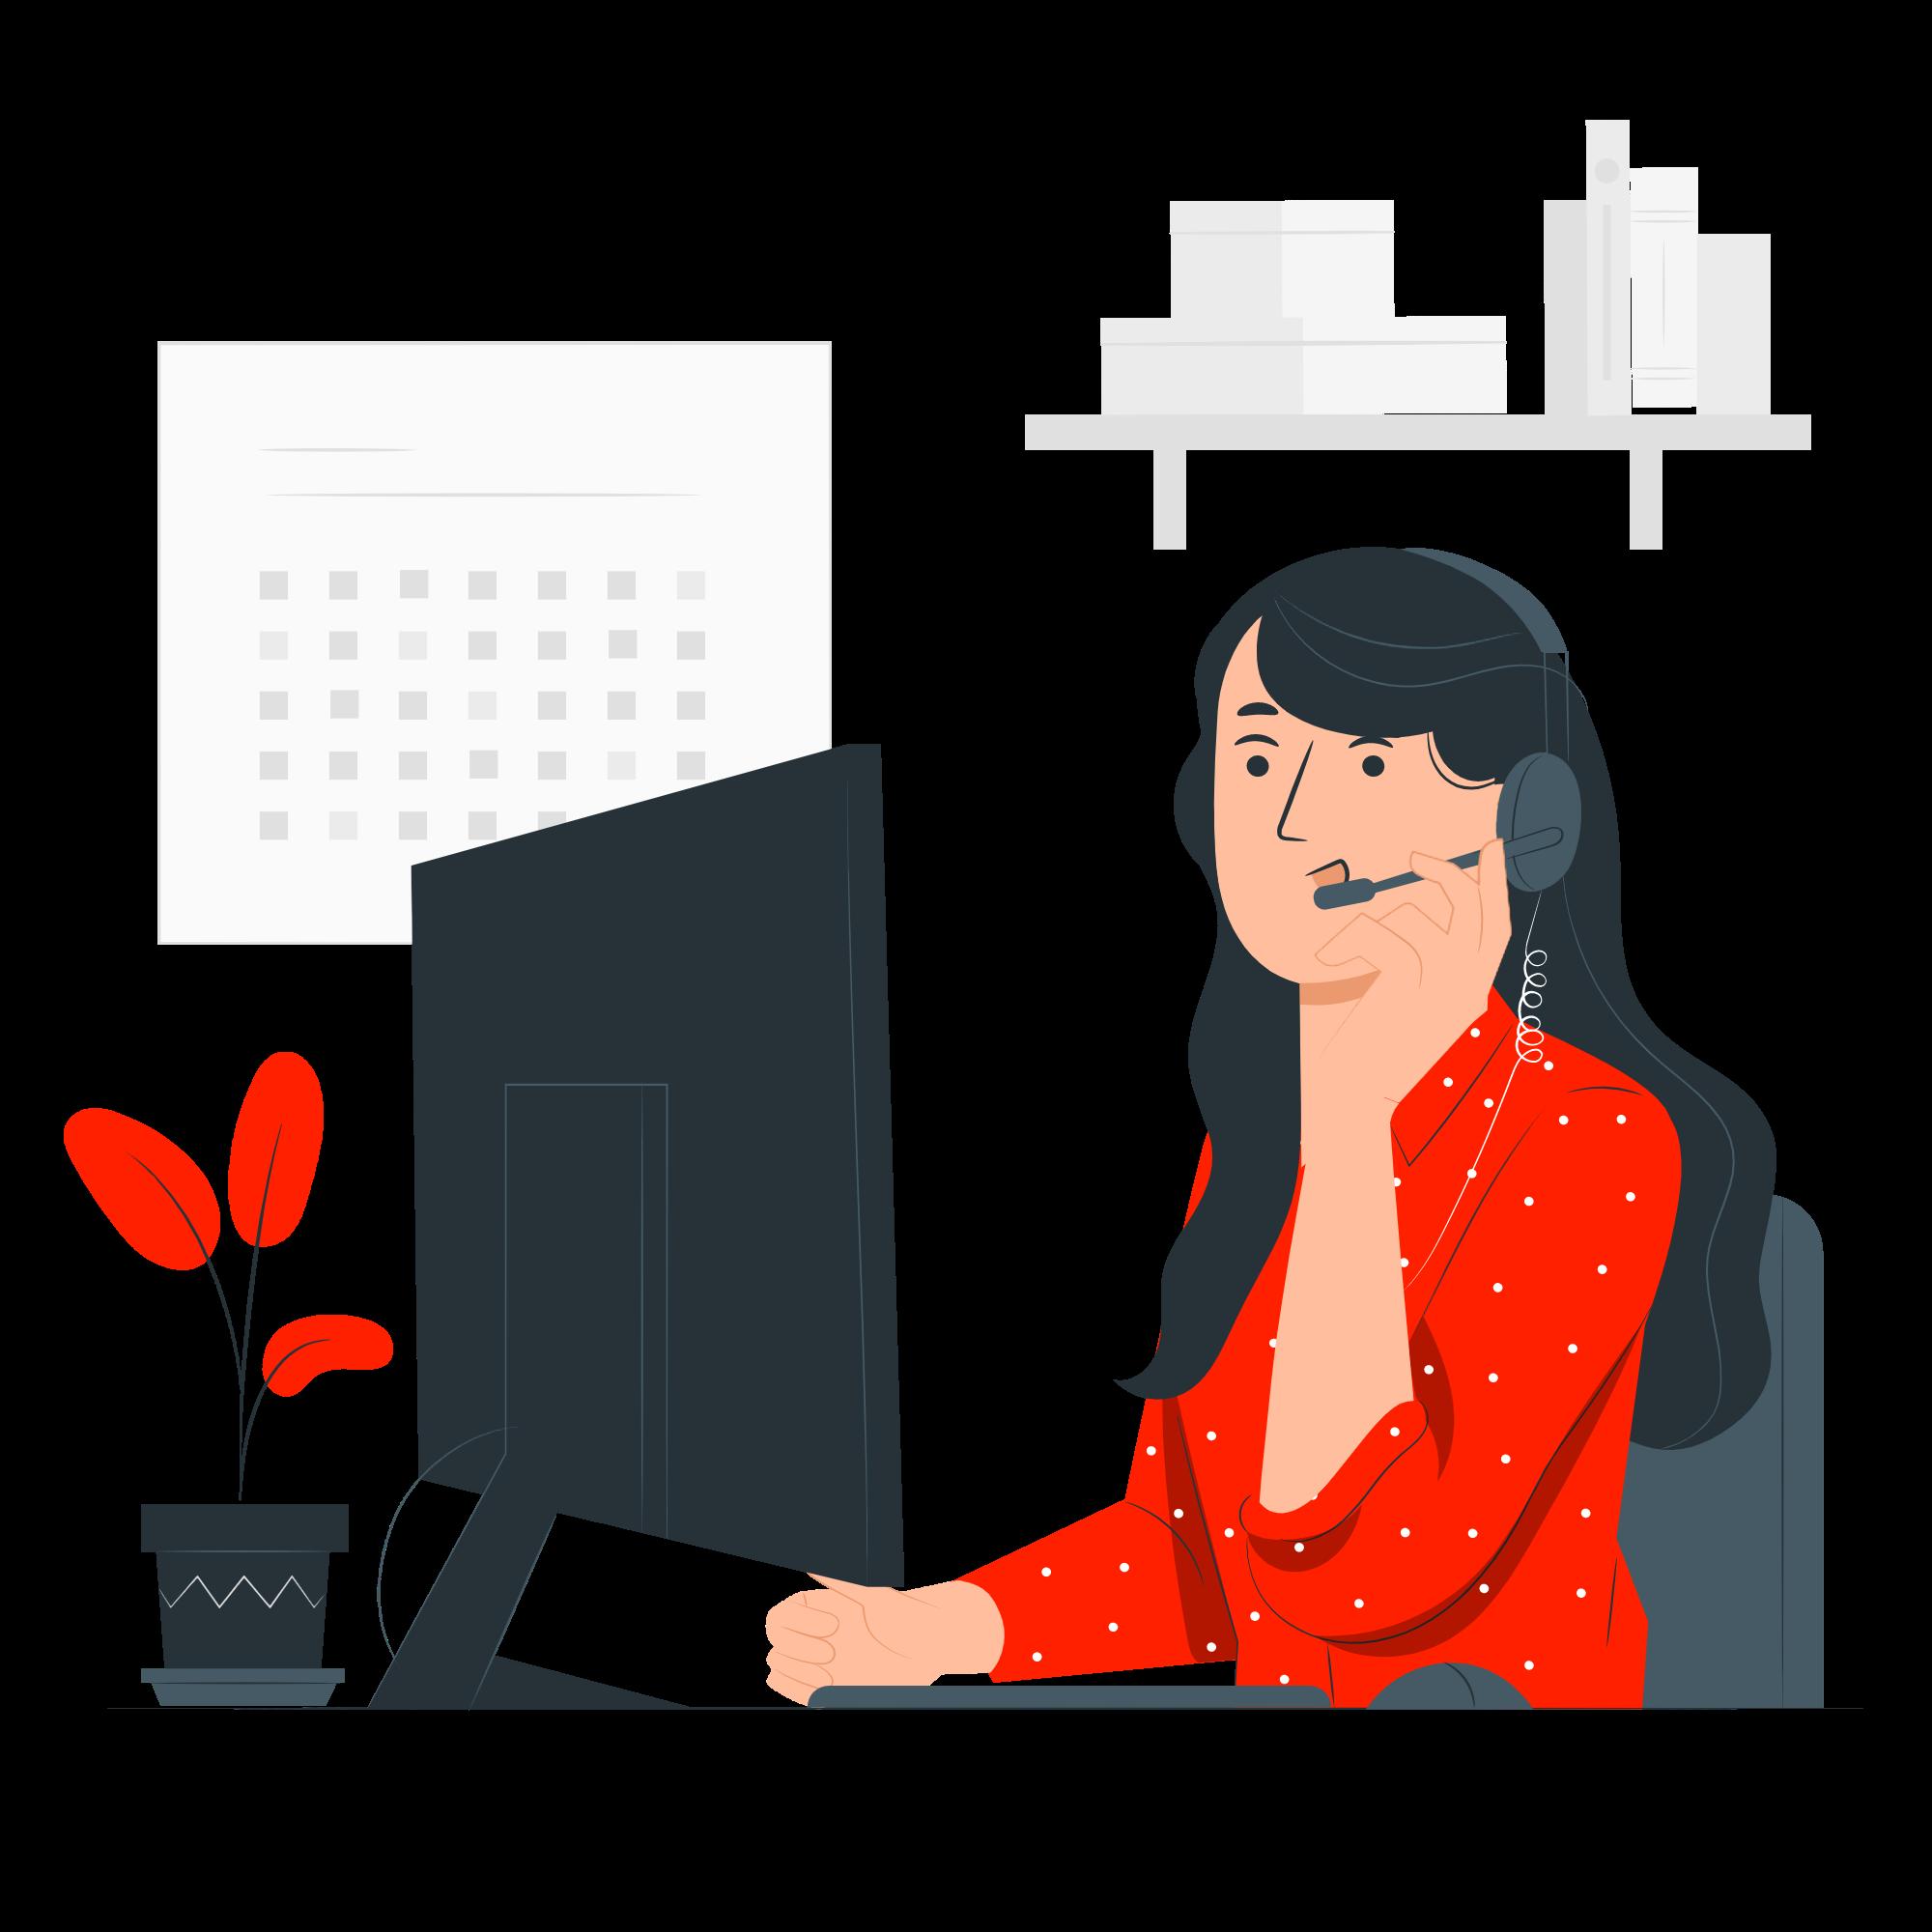 rackset wordpress website design support team